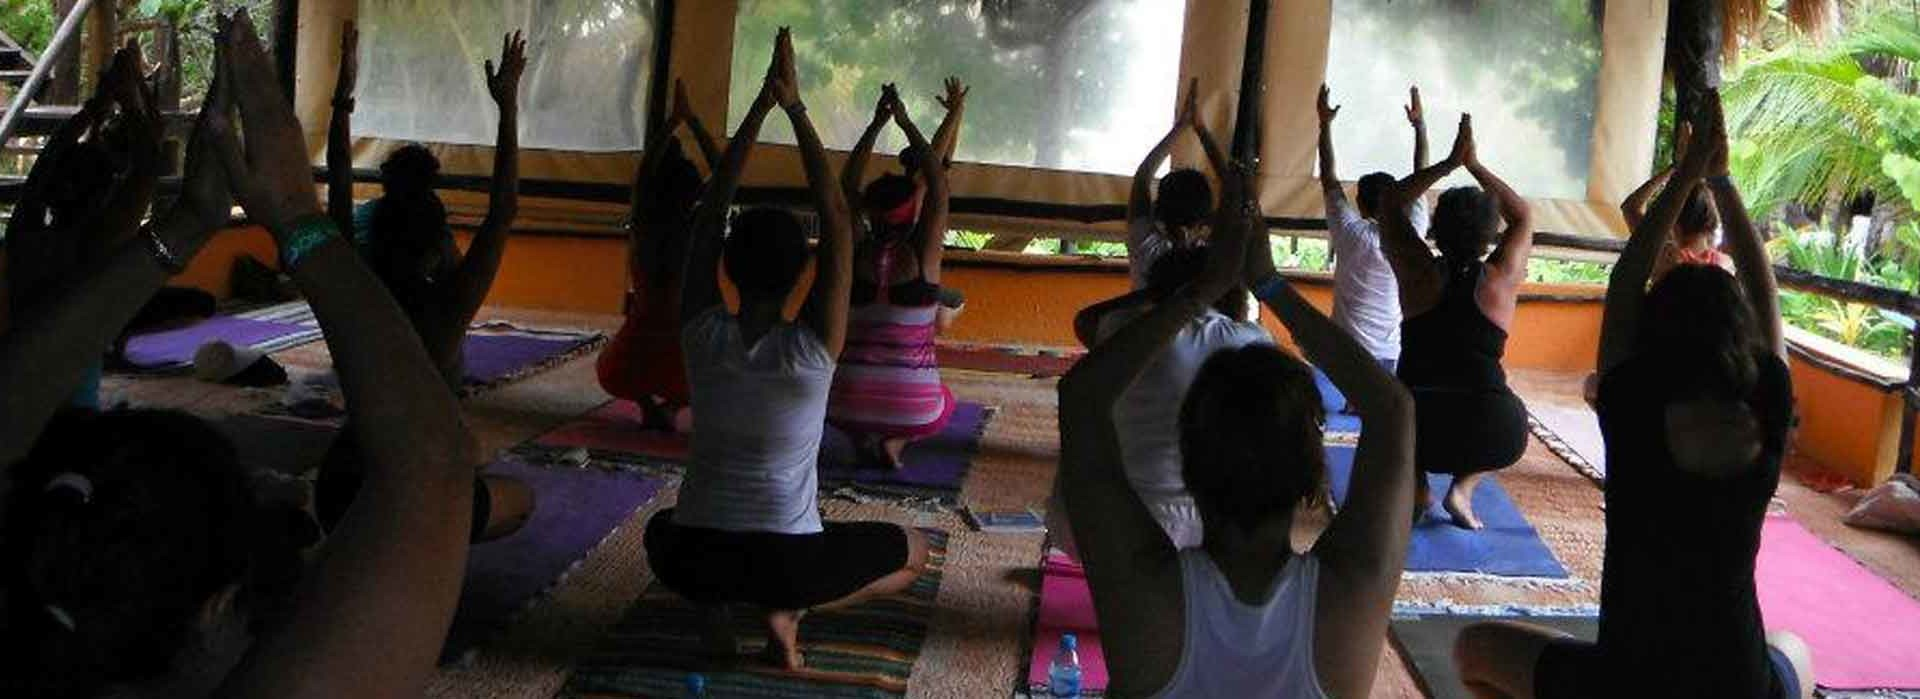 Yoga Class Espanola, Ontario